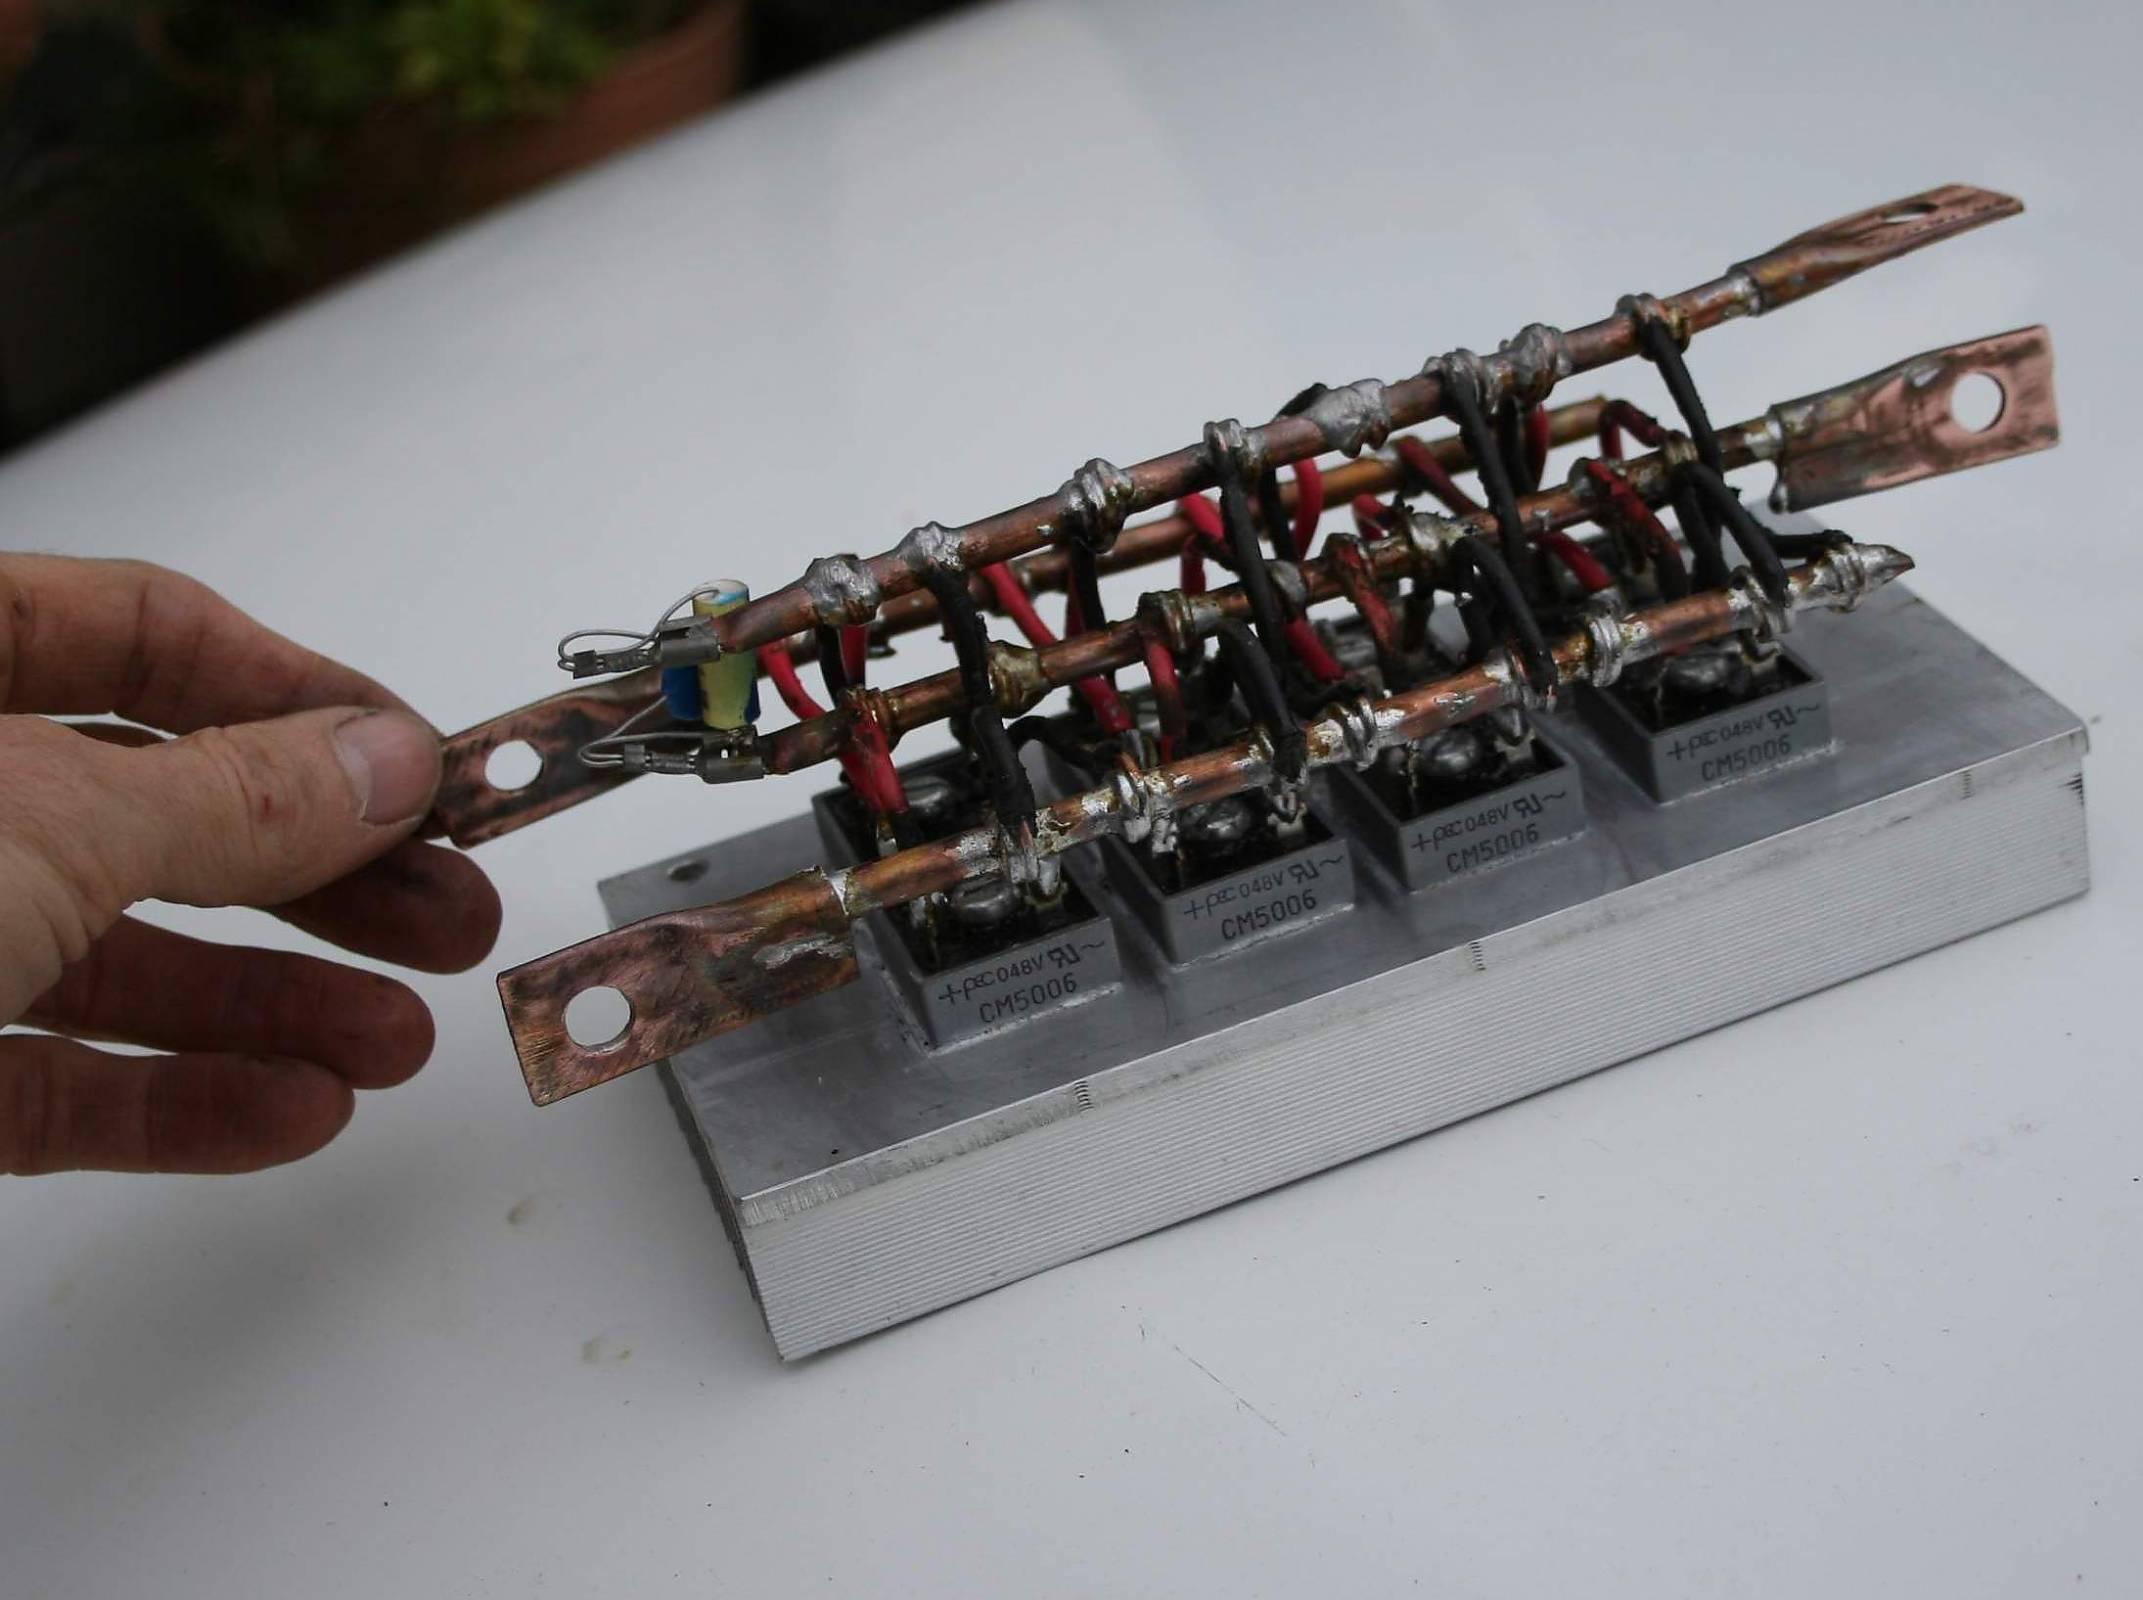 Inverter Welding Machine Circuit Power Diagram Moreover Tig Welder